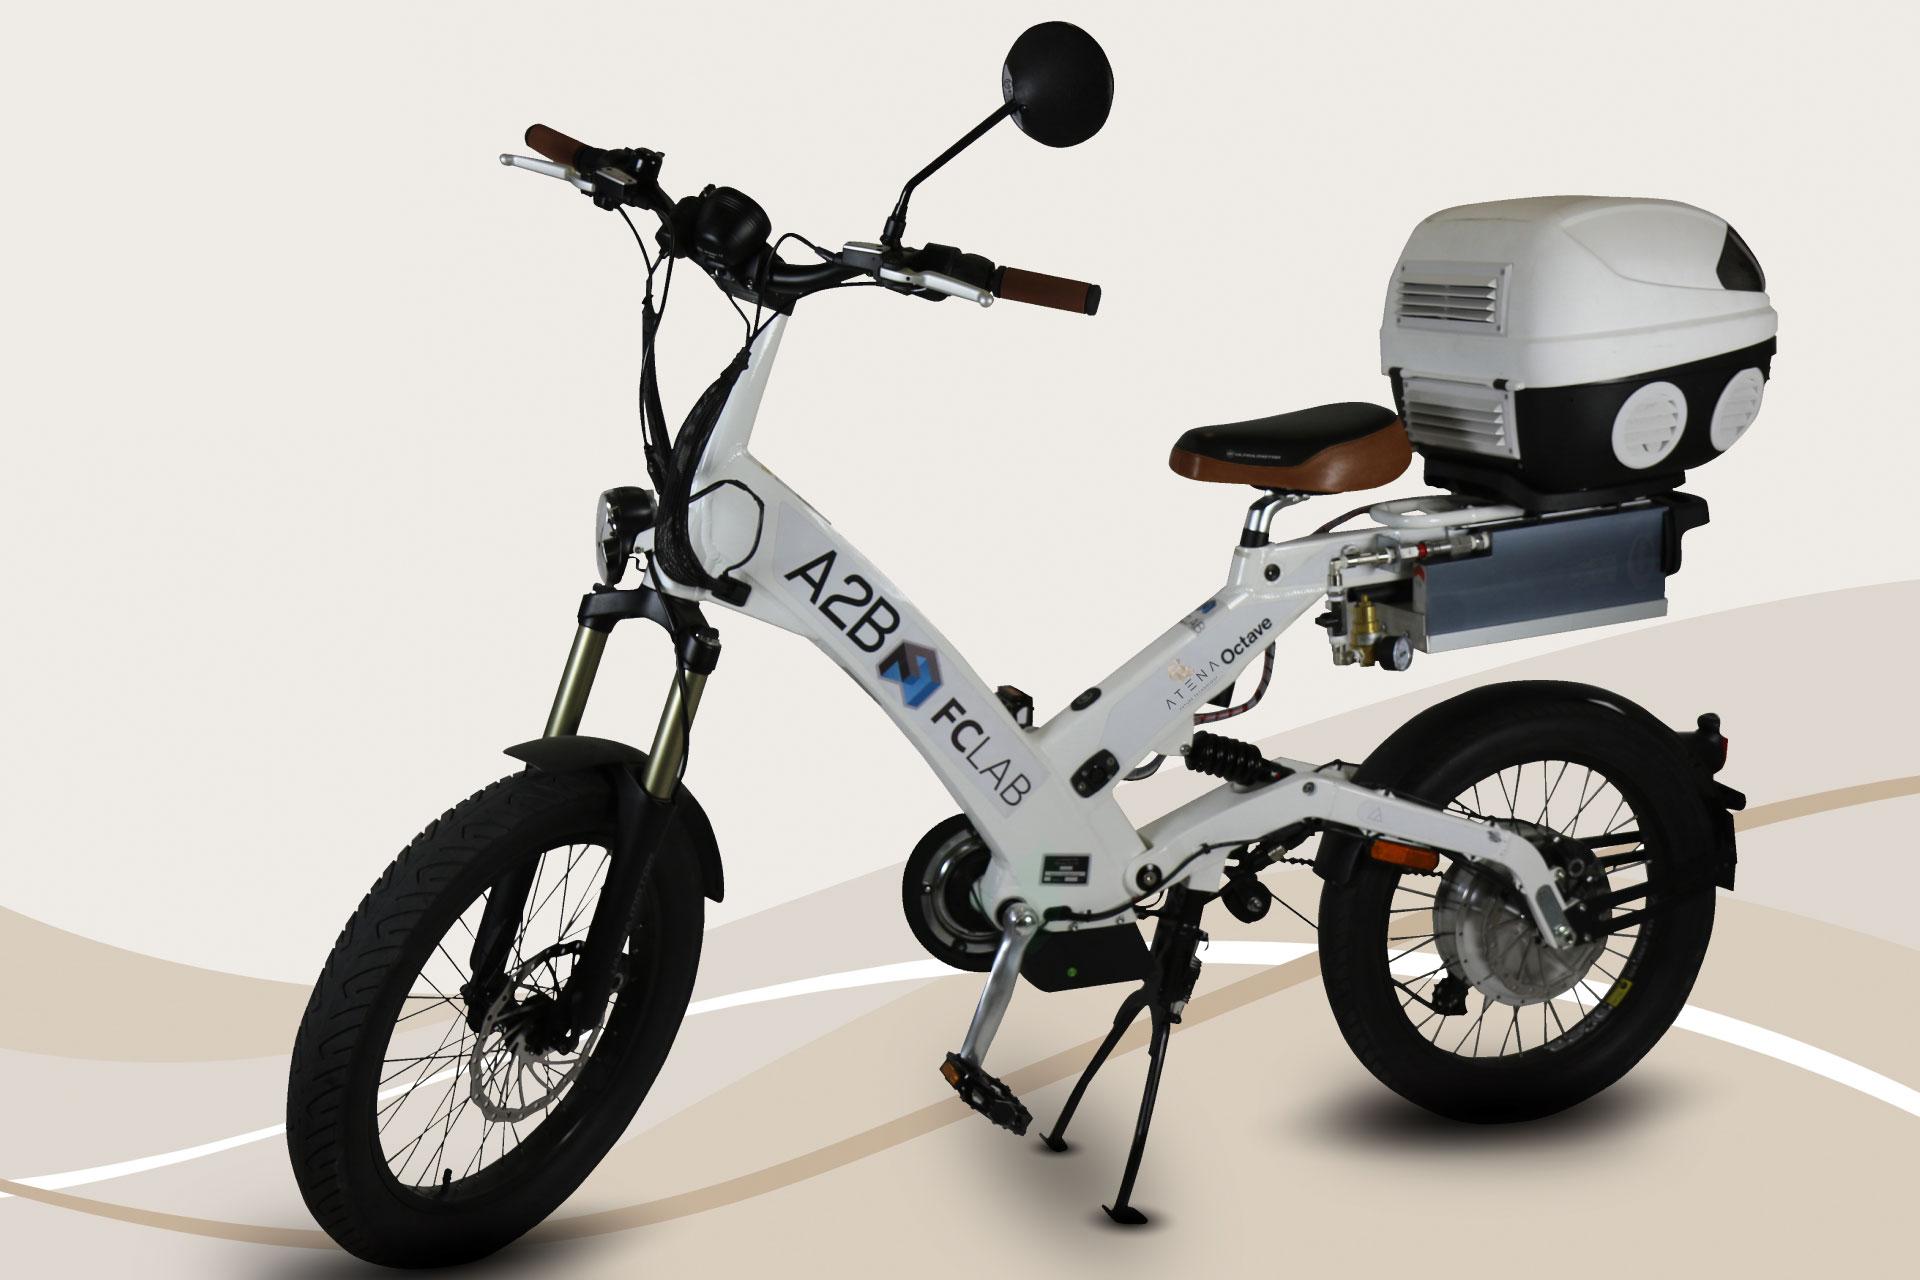 HyBike Sport MB500 | Distretto Atena Future Technology